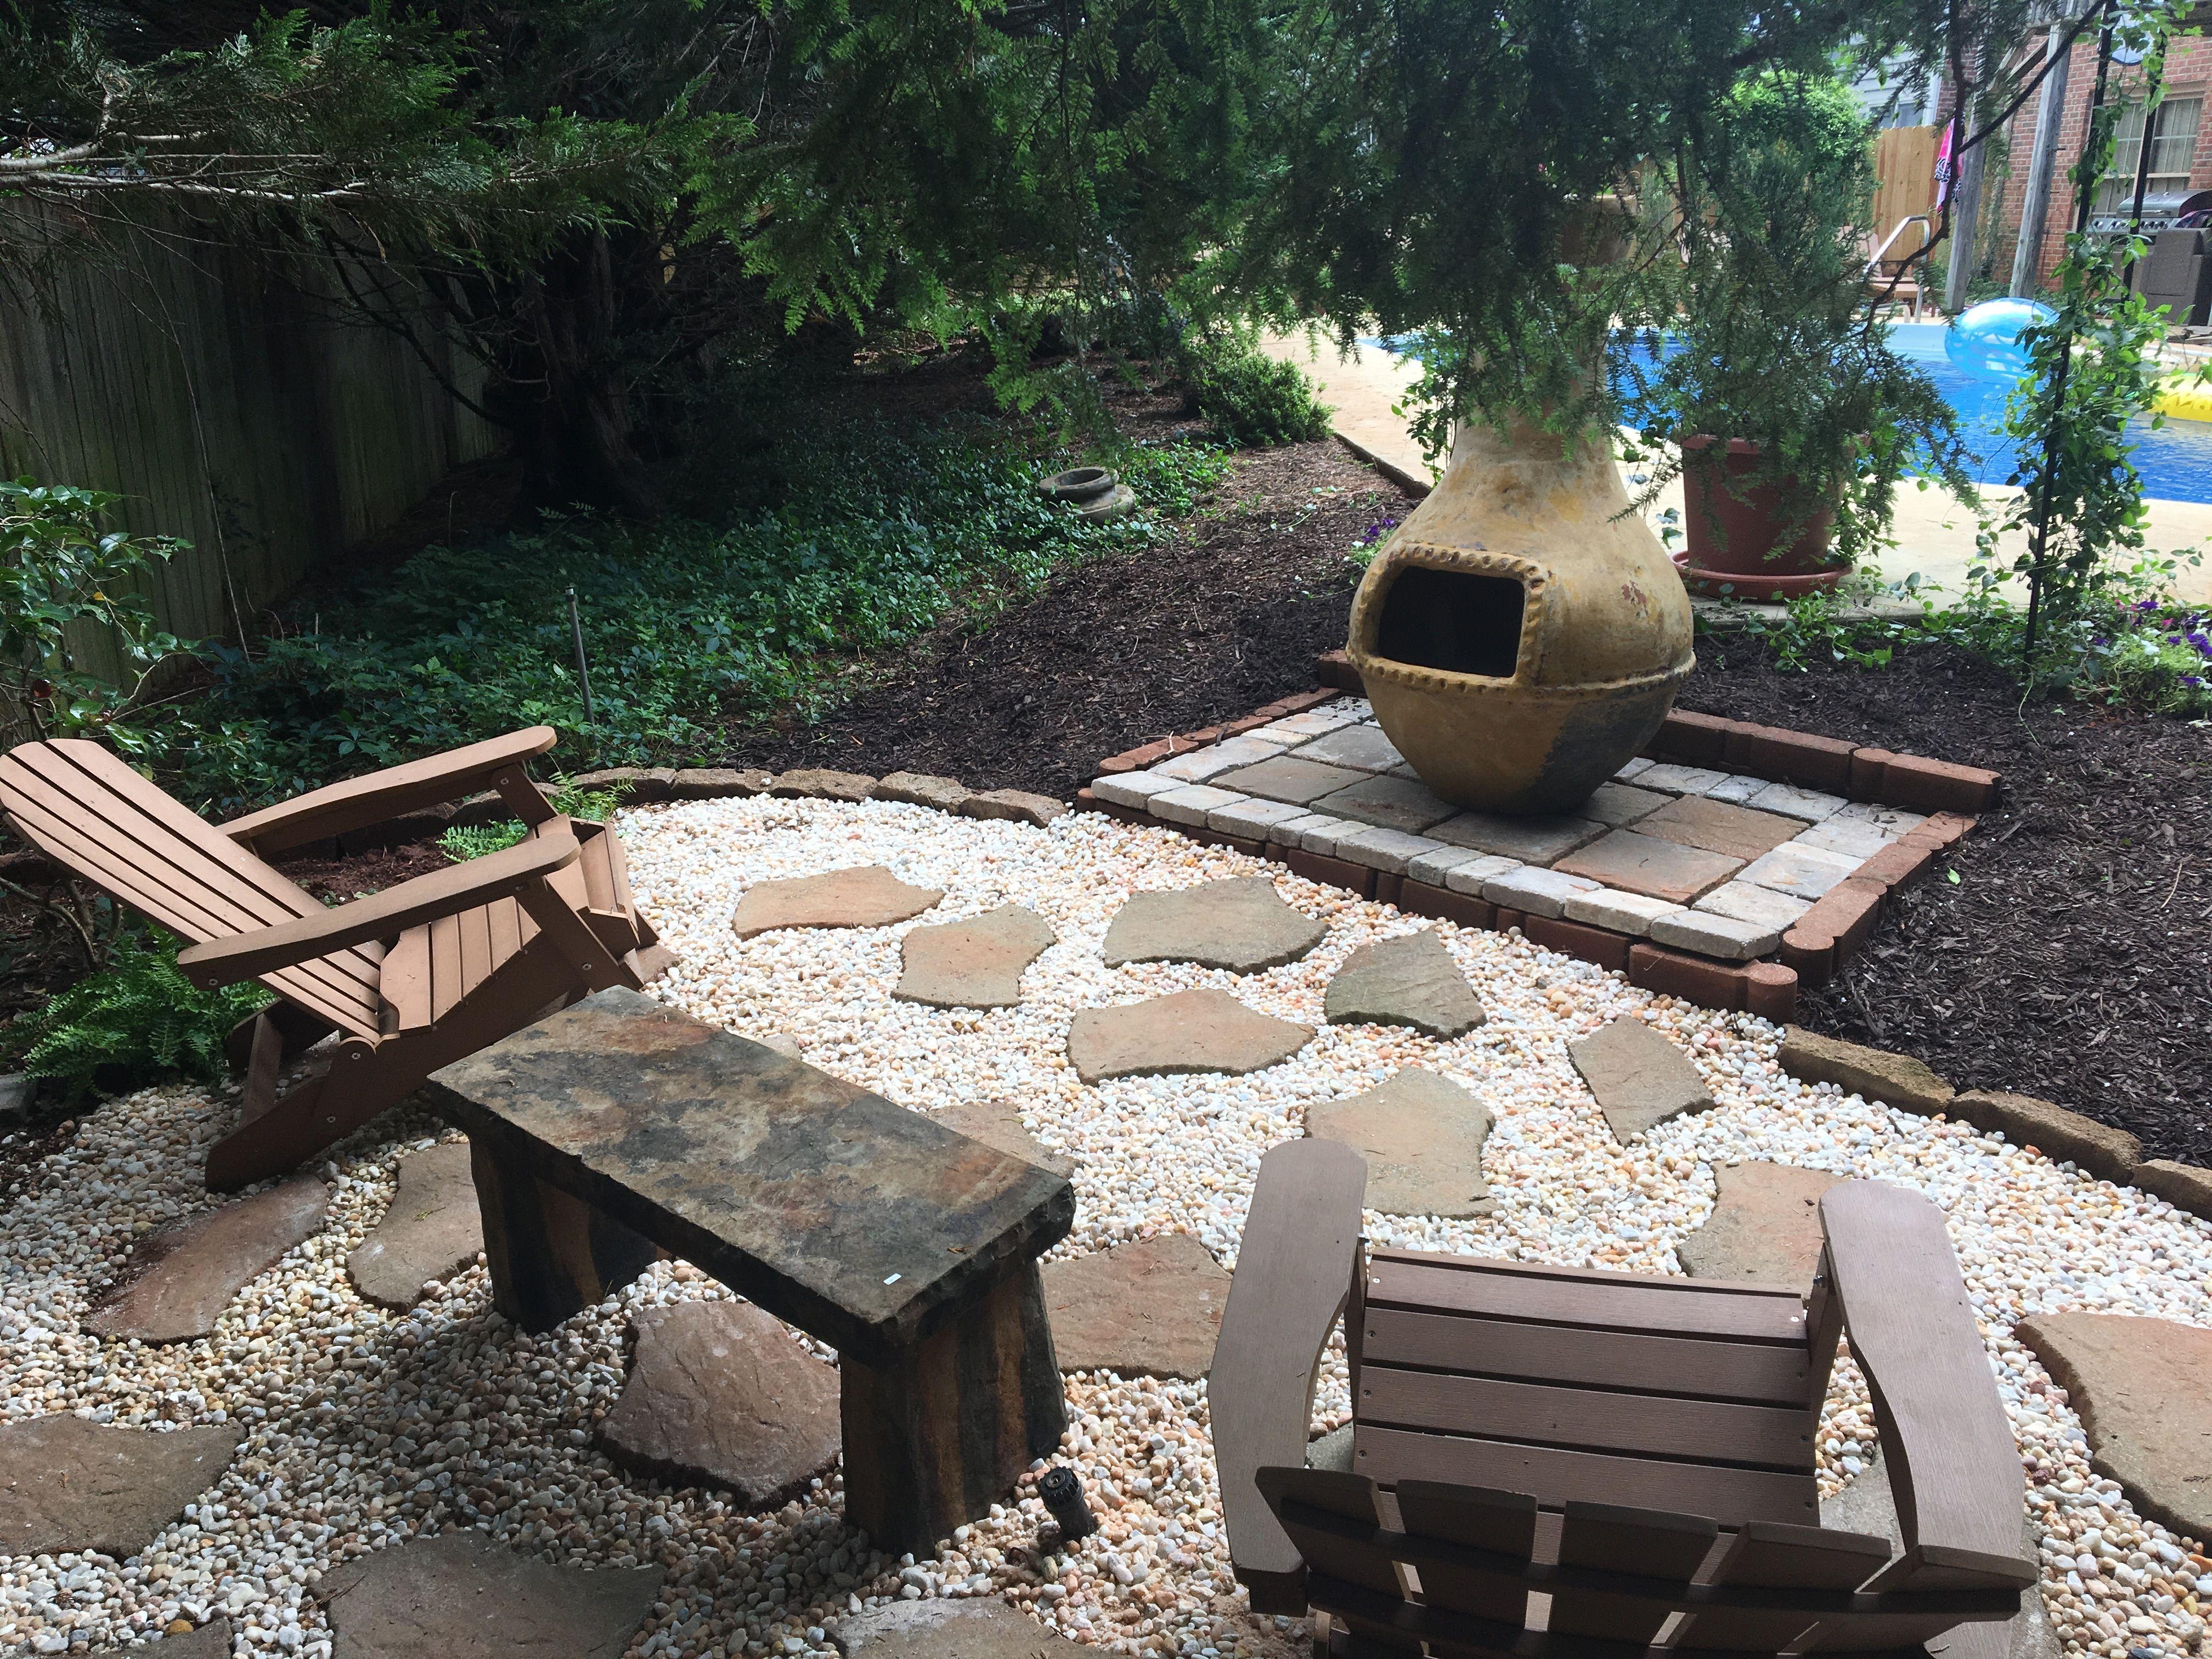 Backyard project. Do it yourself patio.